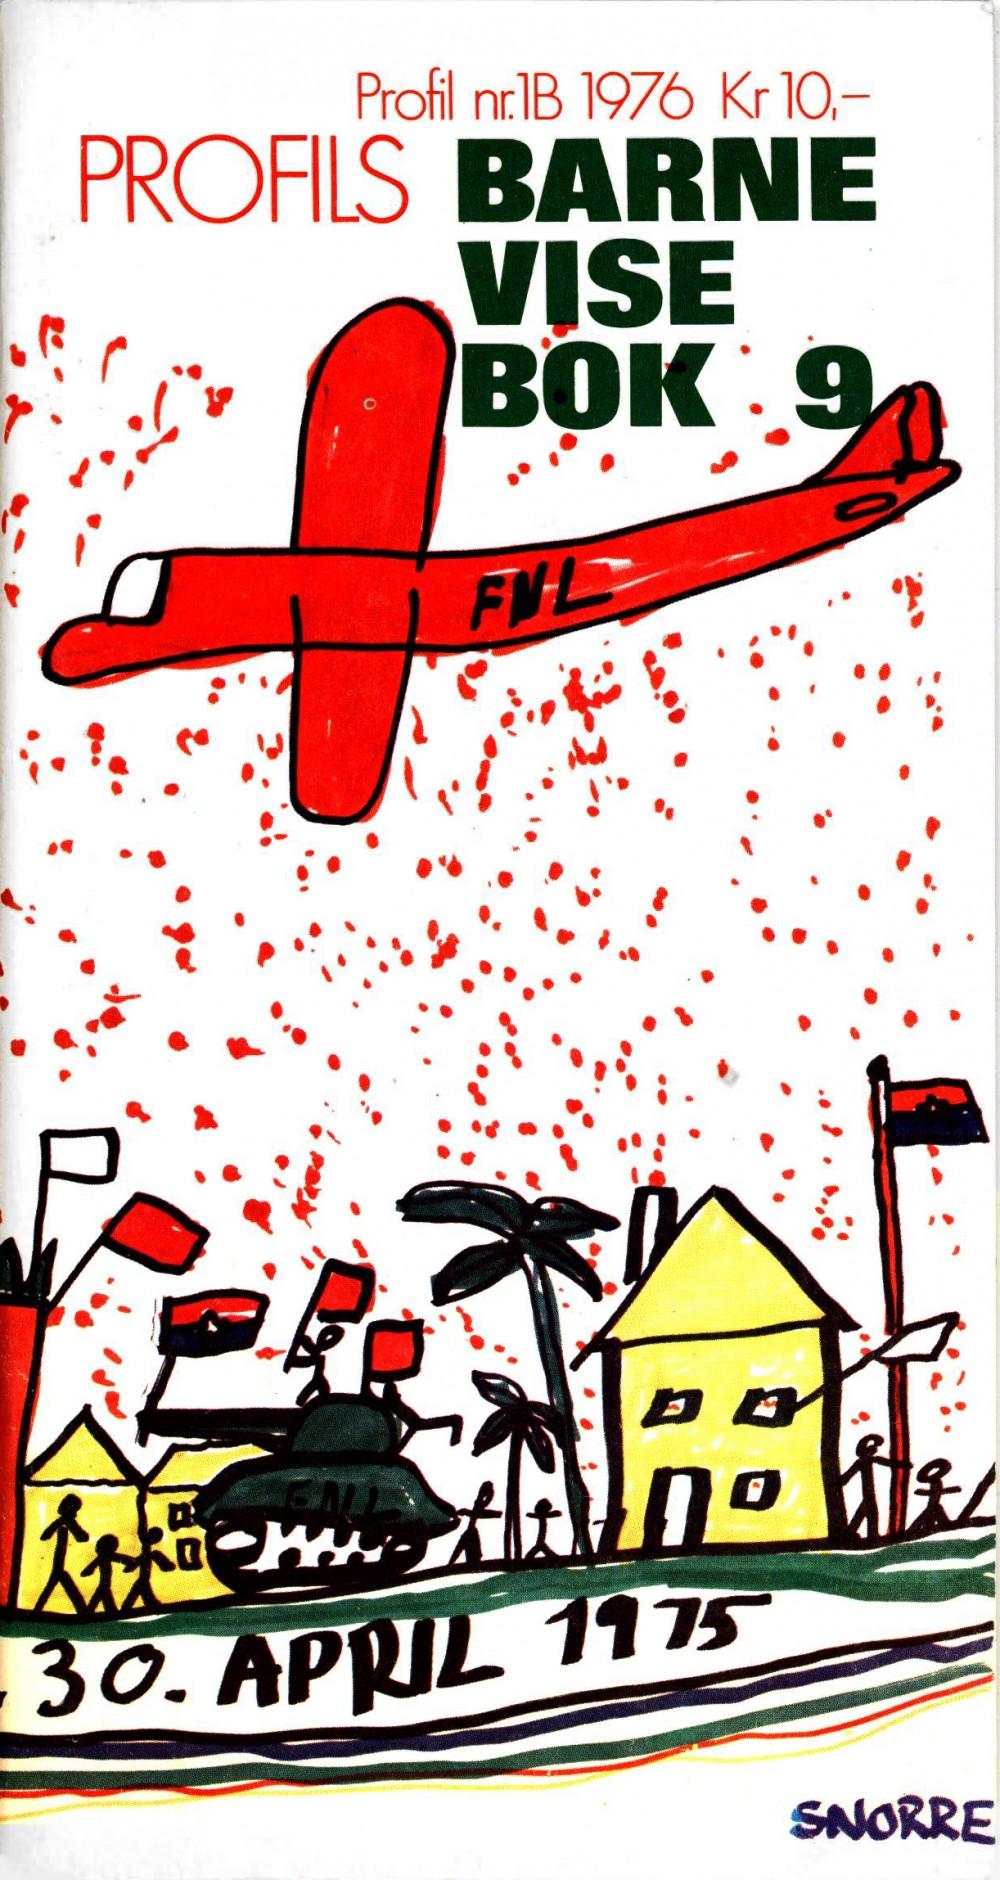 Profils barne-visebok - Profil nr. 1b 1976